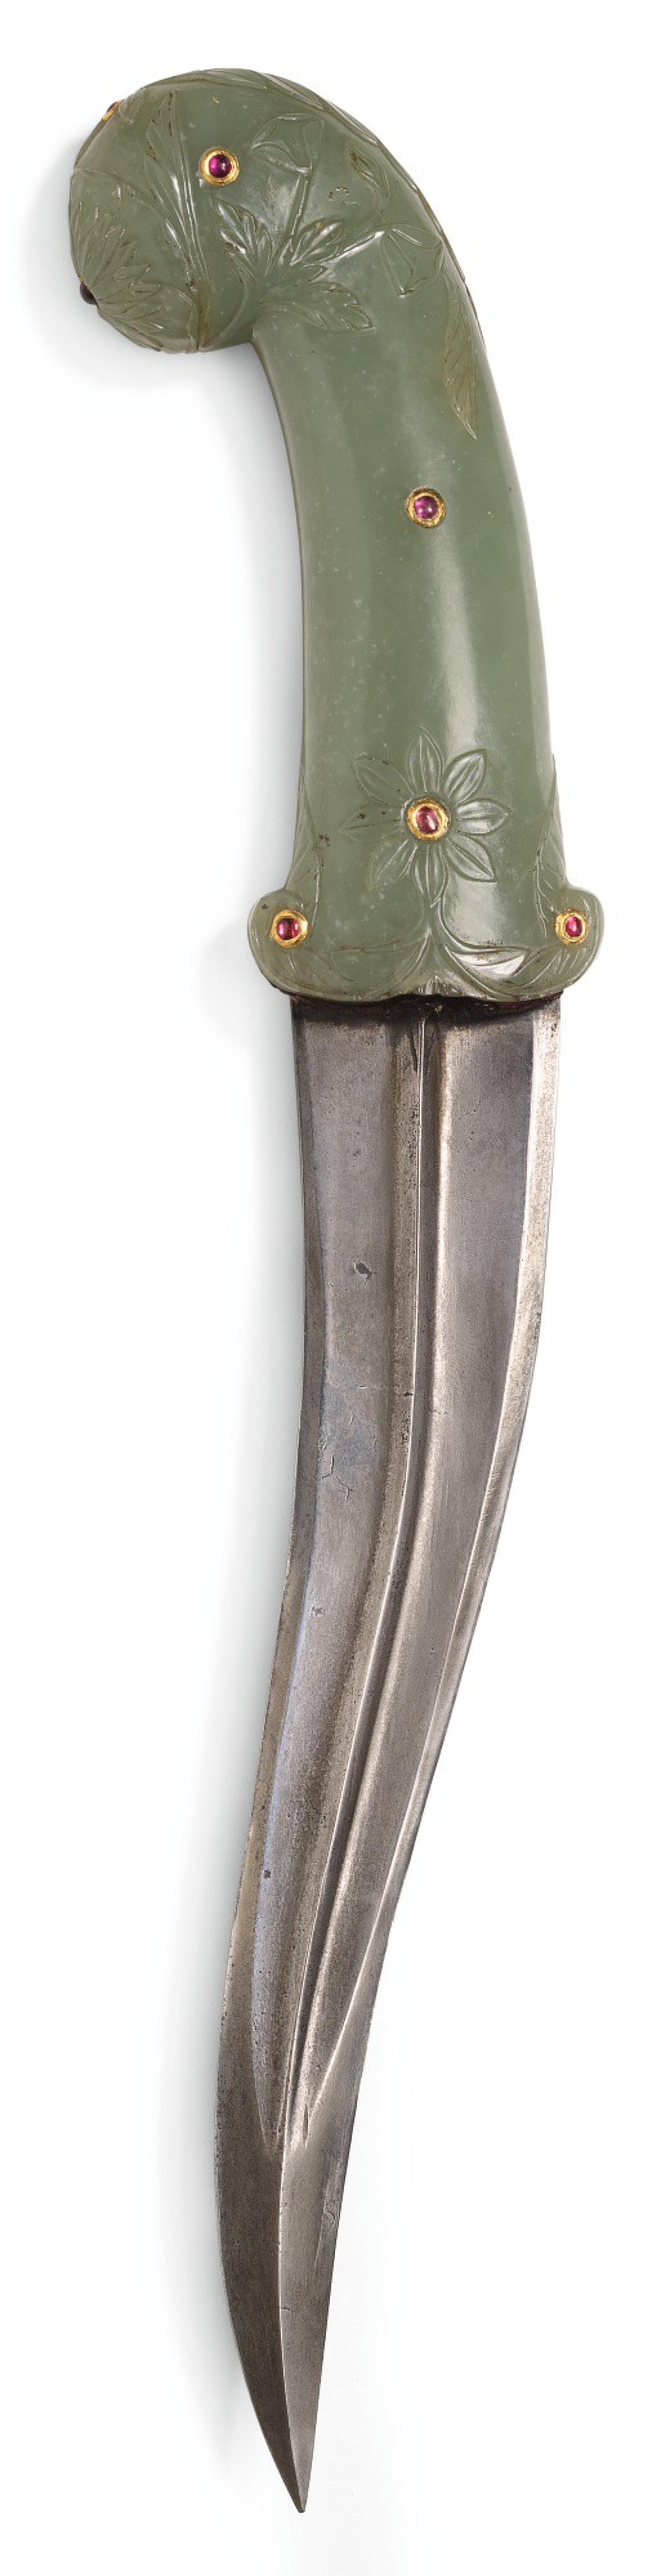 A MUGHAL JEWELLED JADE-HILTED DAGGER (KHANJAR), INDIA, LATE 18TH CENTURY